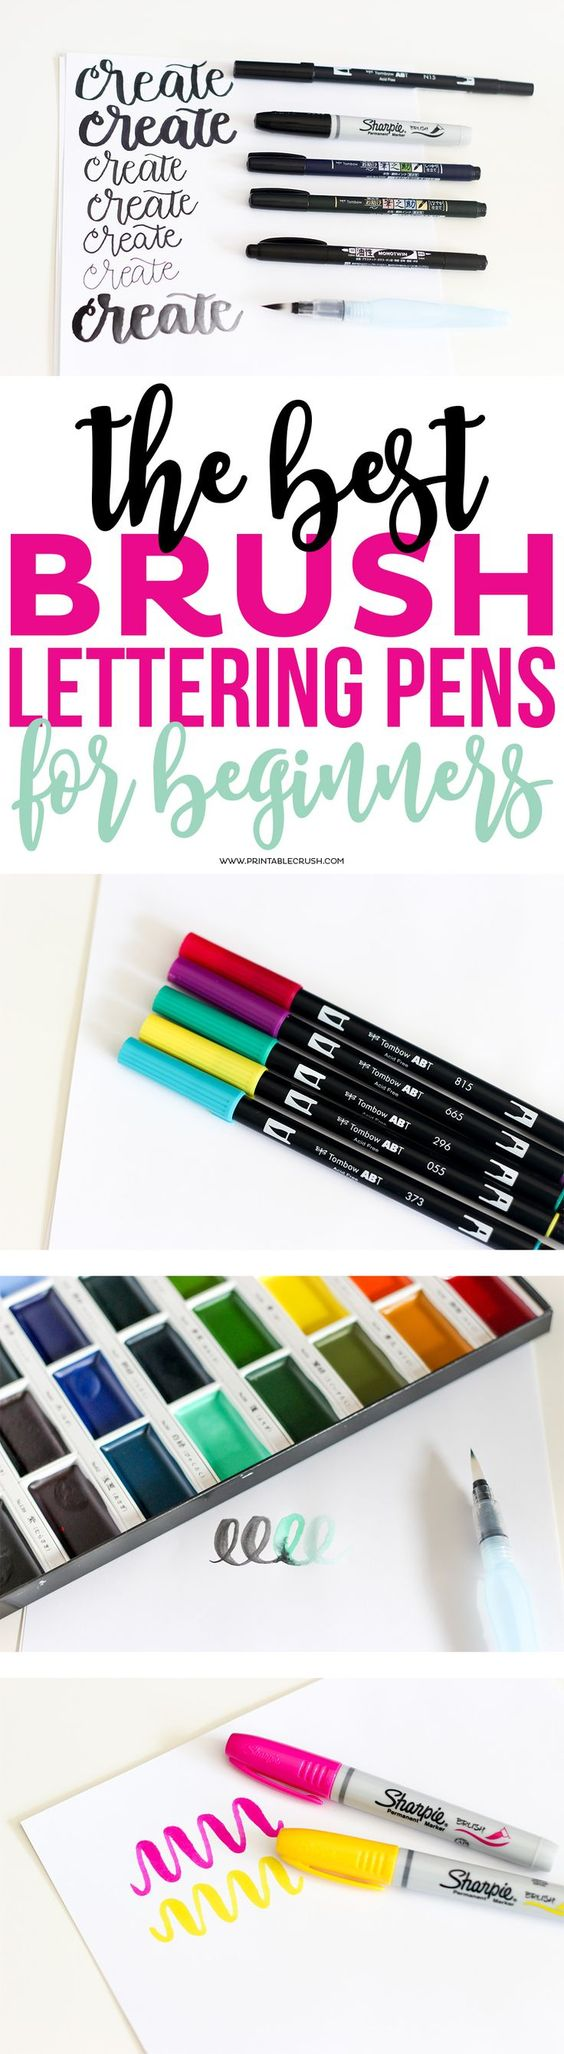 best 25 best hand tools ideas on pinterest best calligraphy